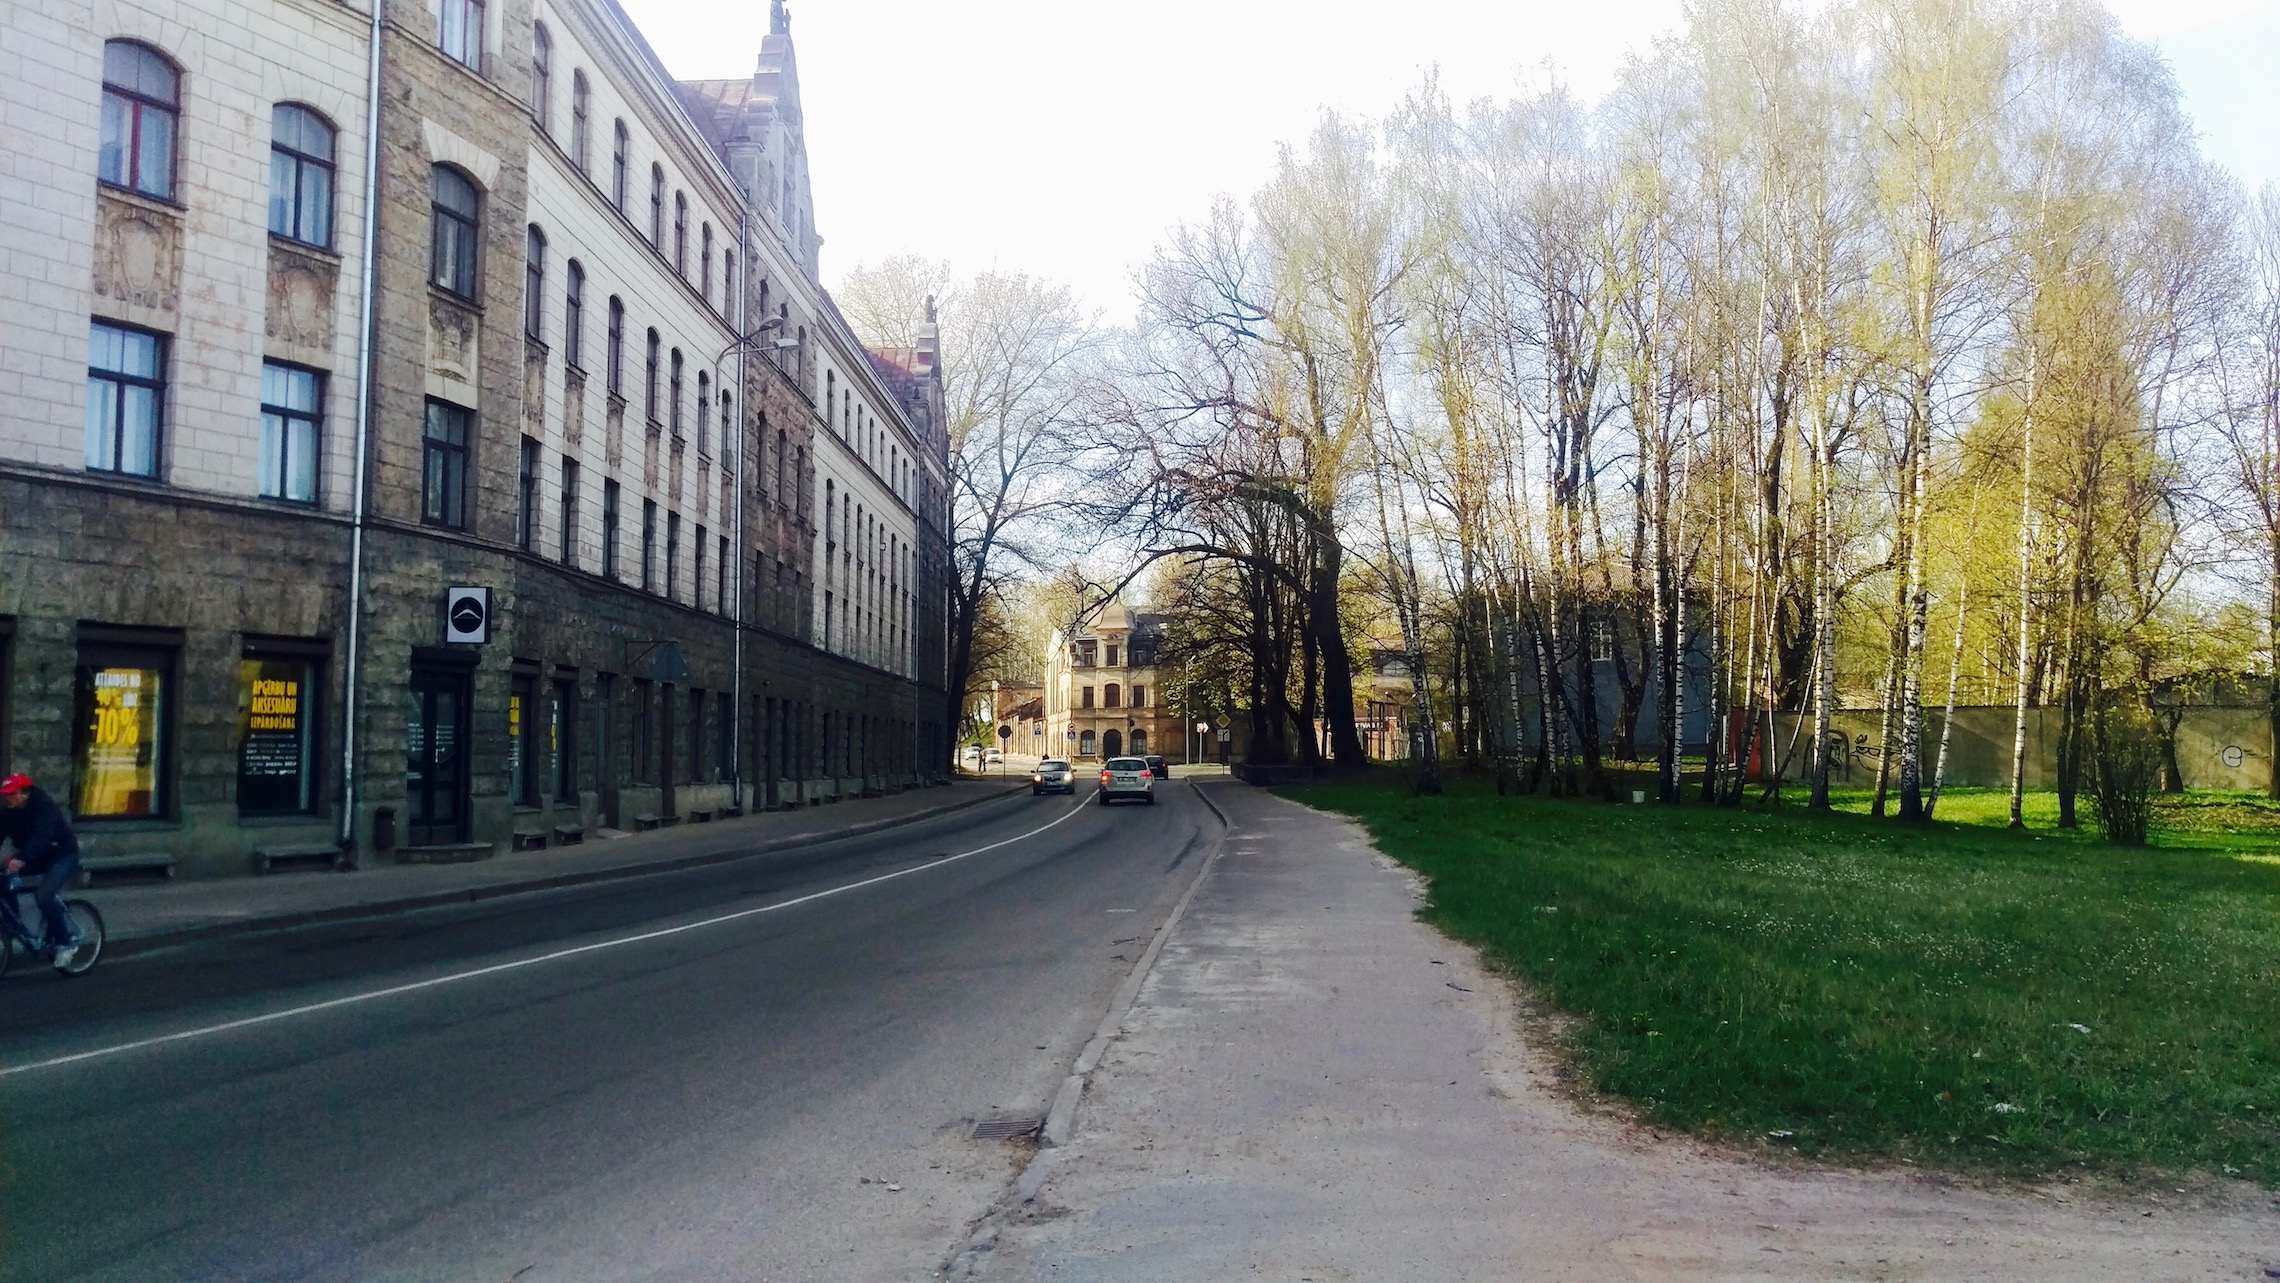 A quiet, residential neighborhood close to transportation